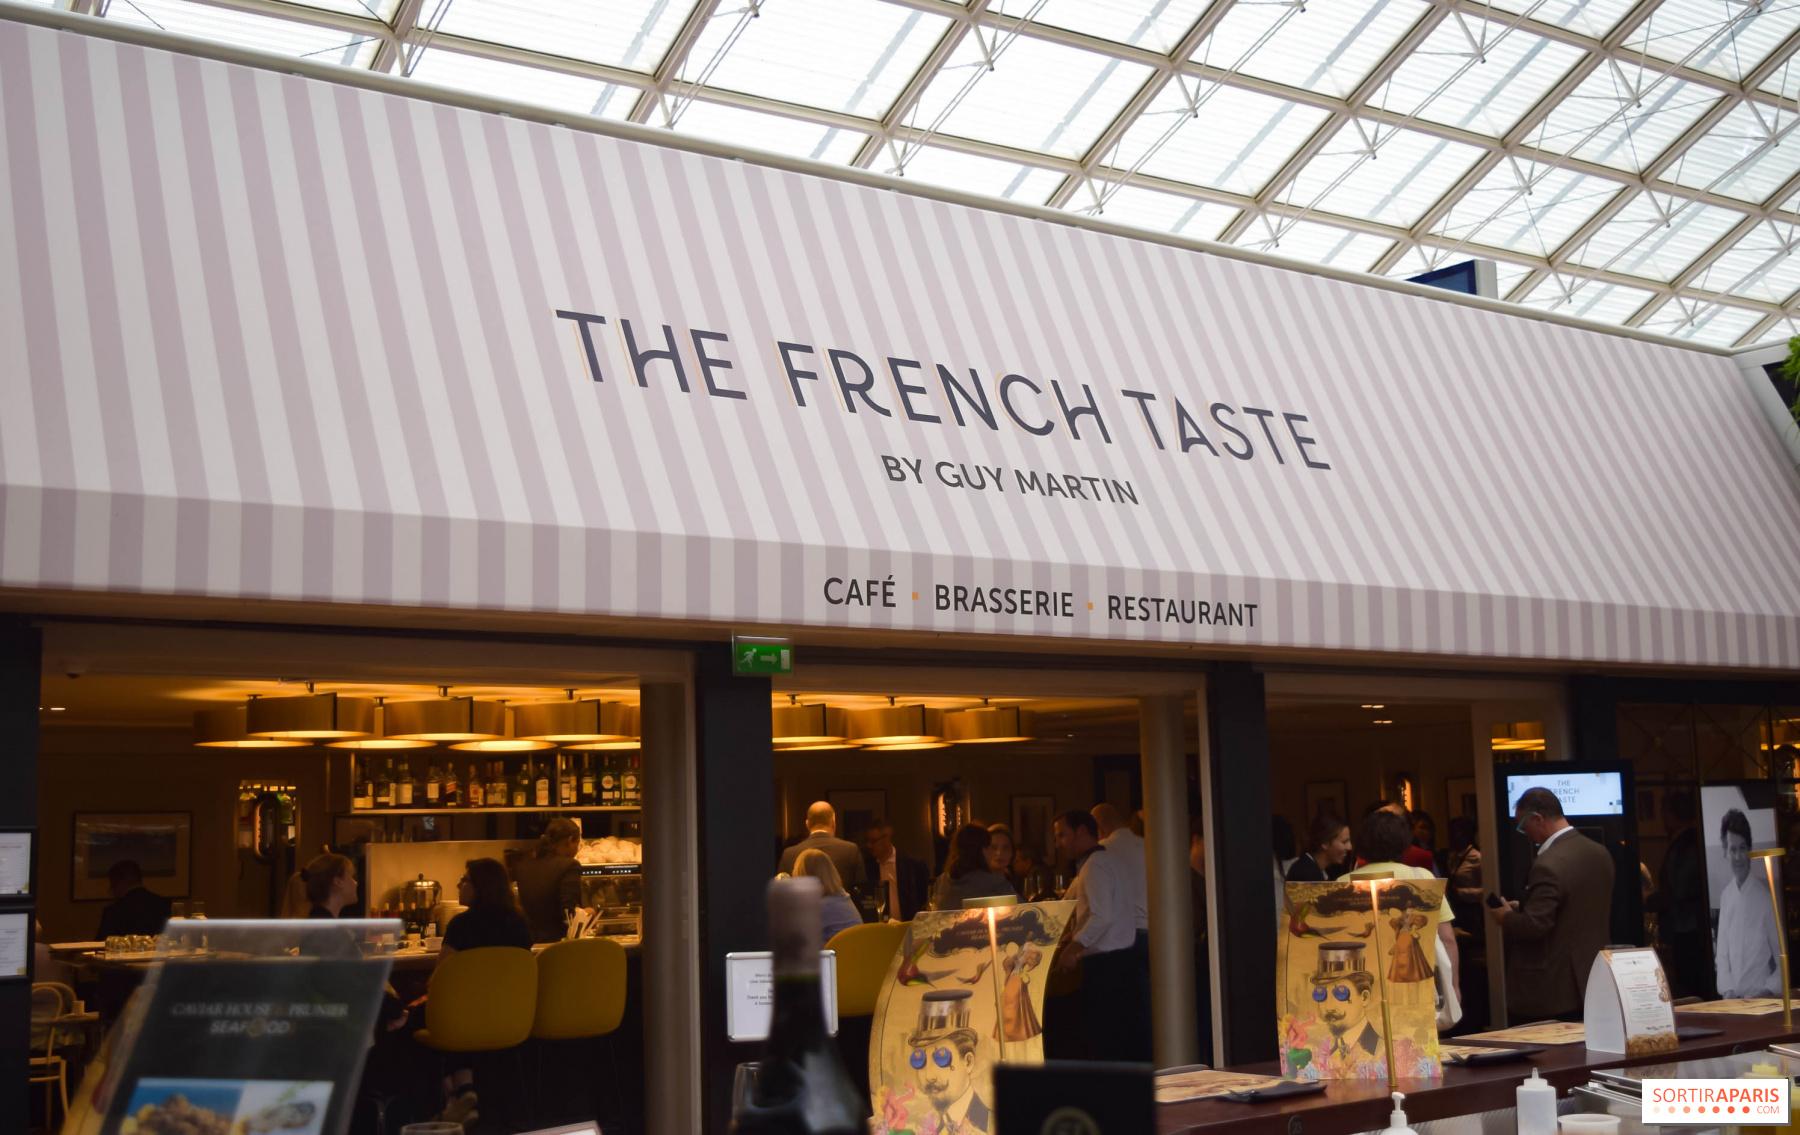 The French Taste Guy Martin S Bistronomic Restaurant At